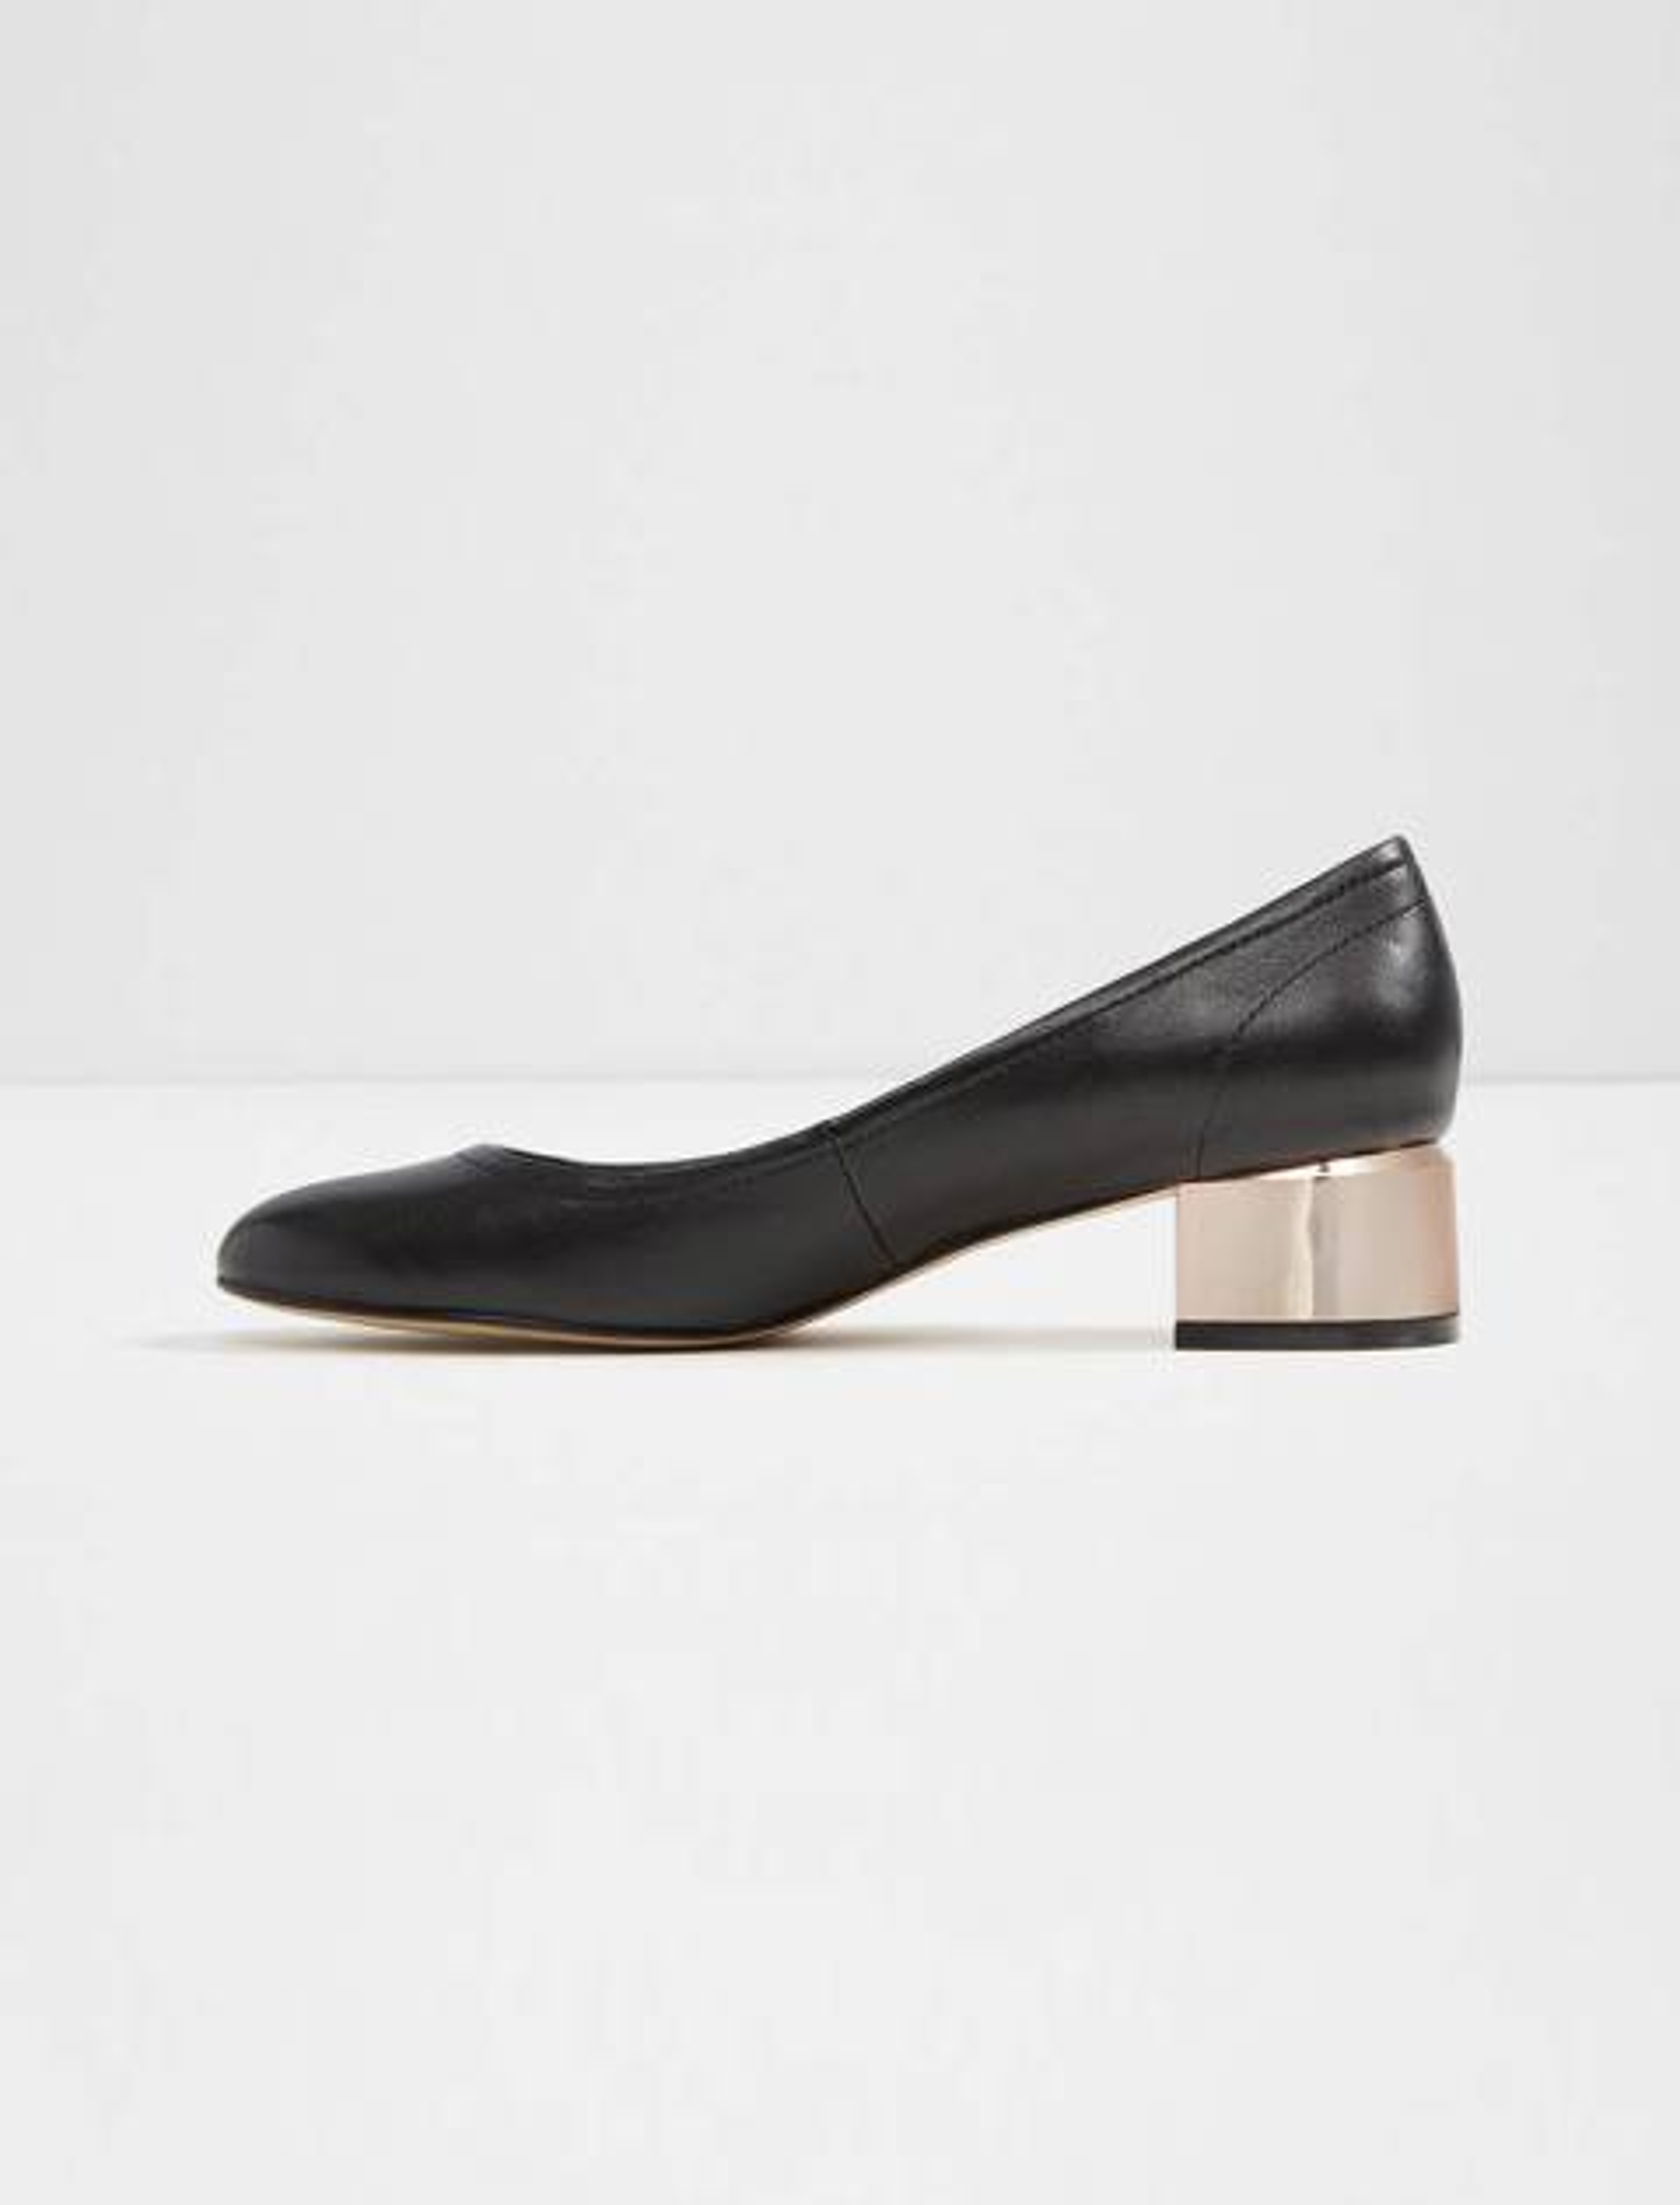 کفش پاشنه بلند چرم زنانه - مشکي - 2